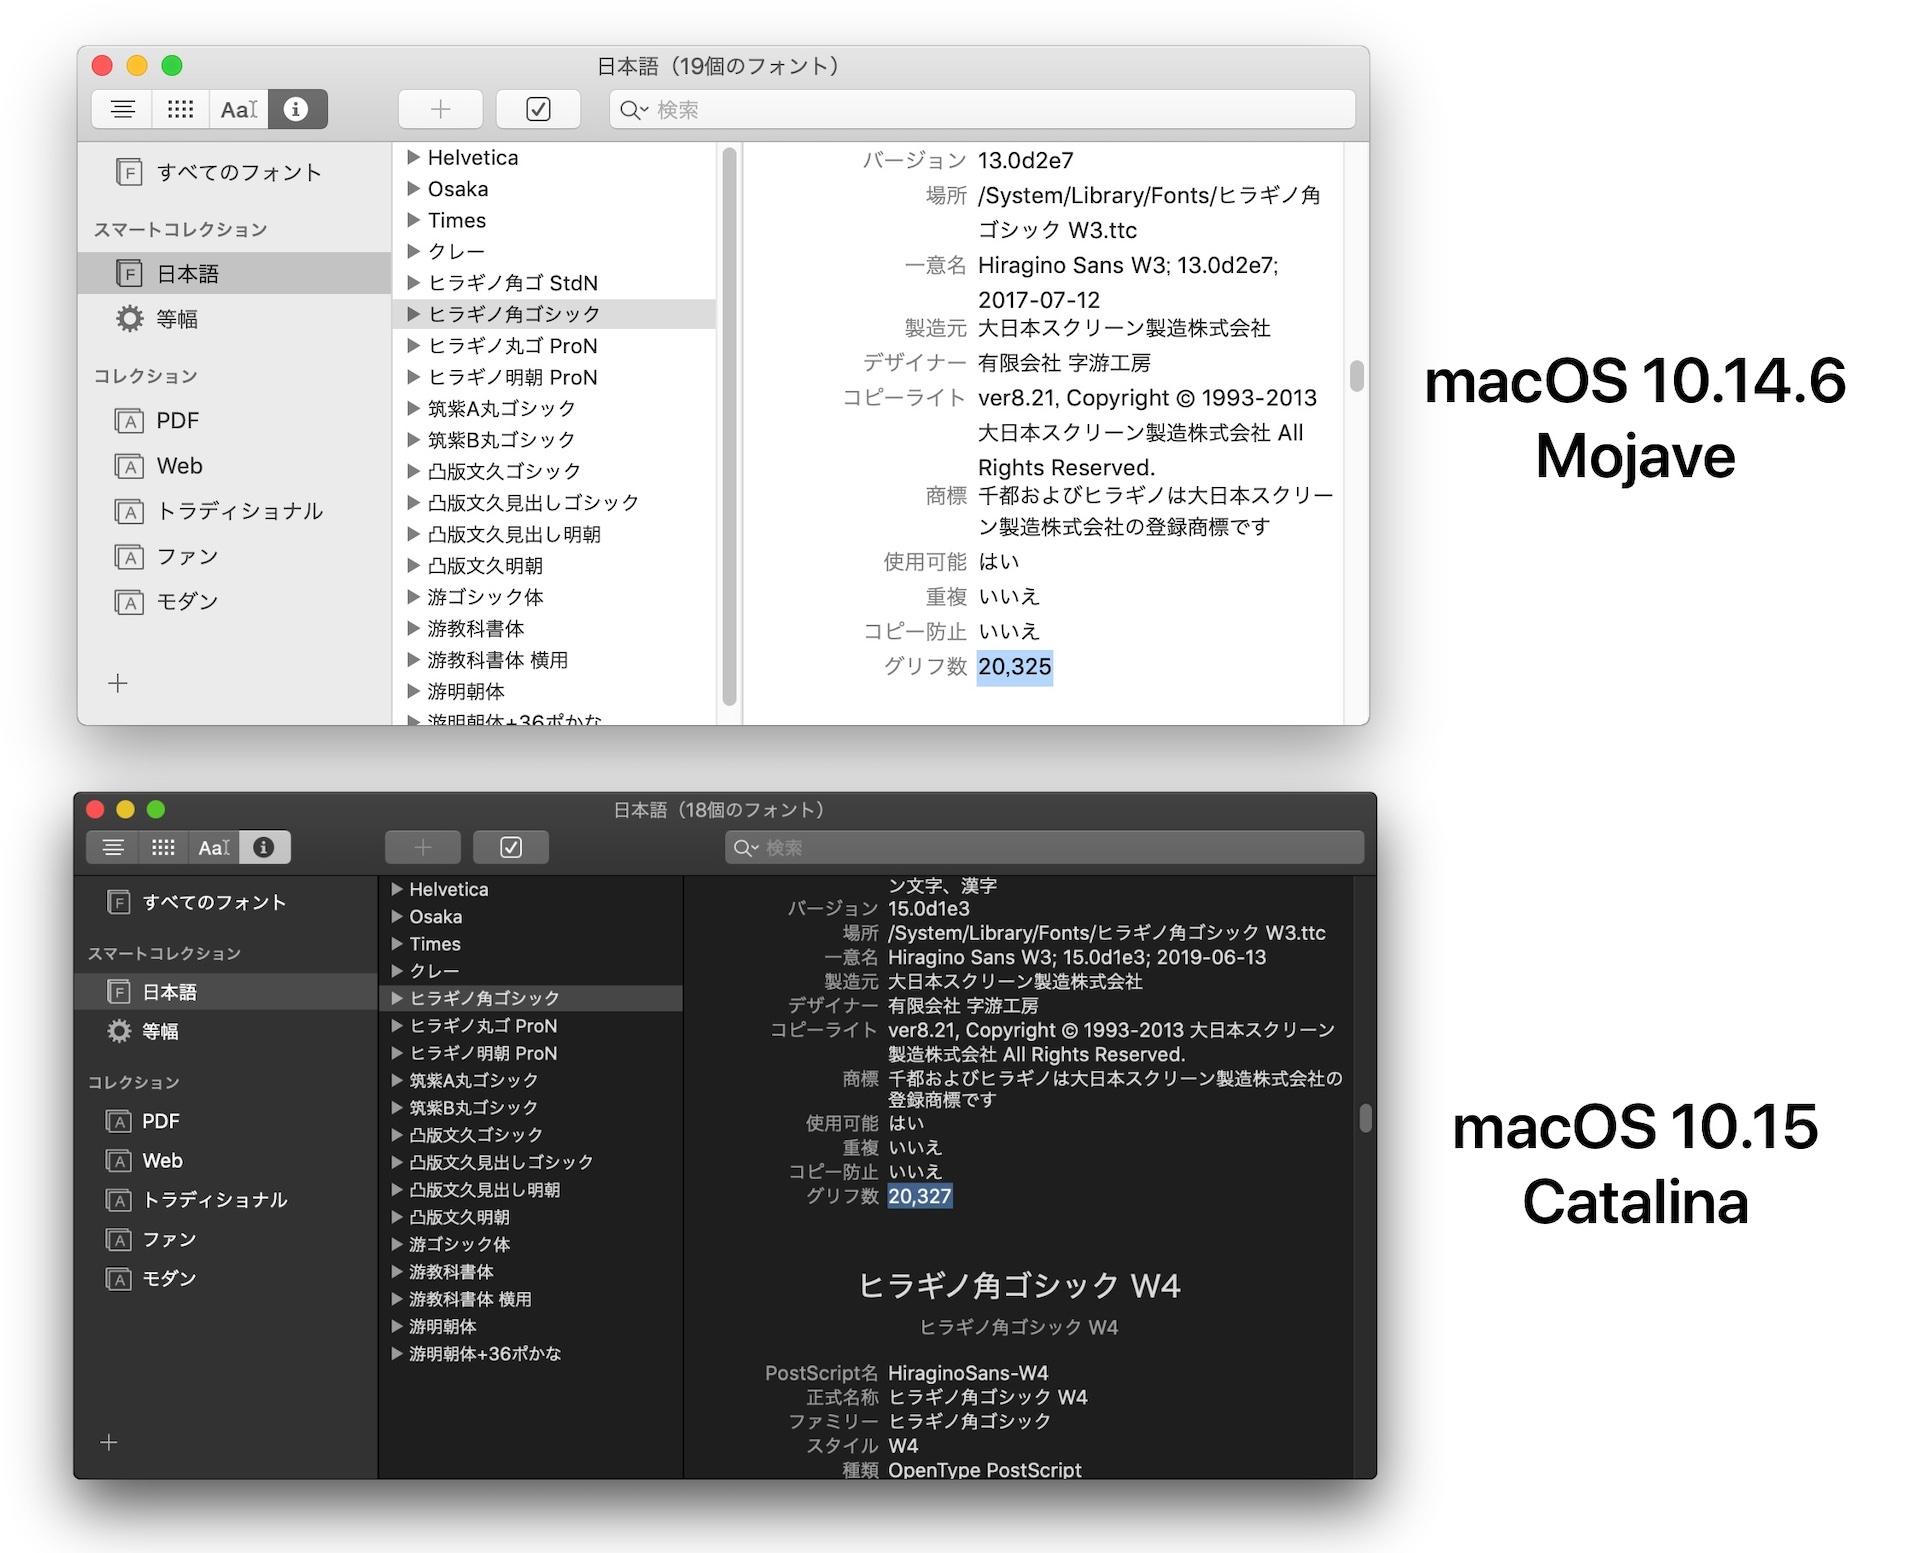 Hiragino Sans W3 15.0d1e3 on macOS 10.15 Catalina